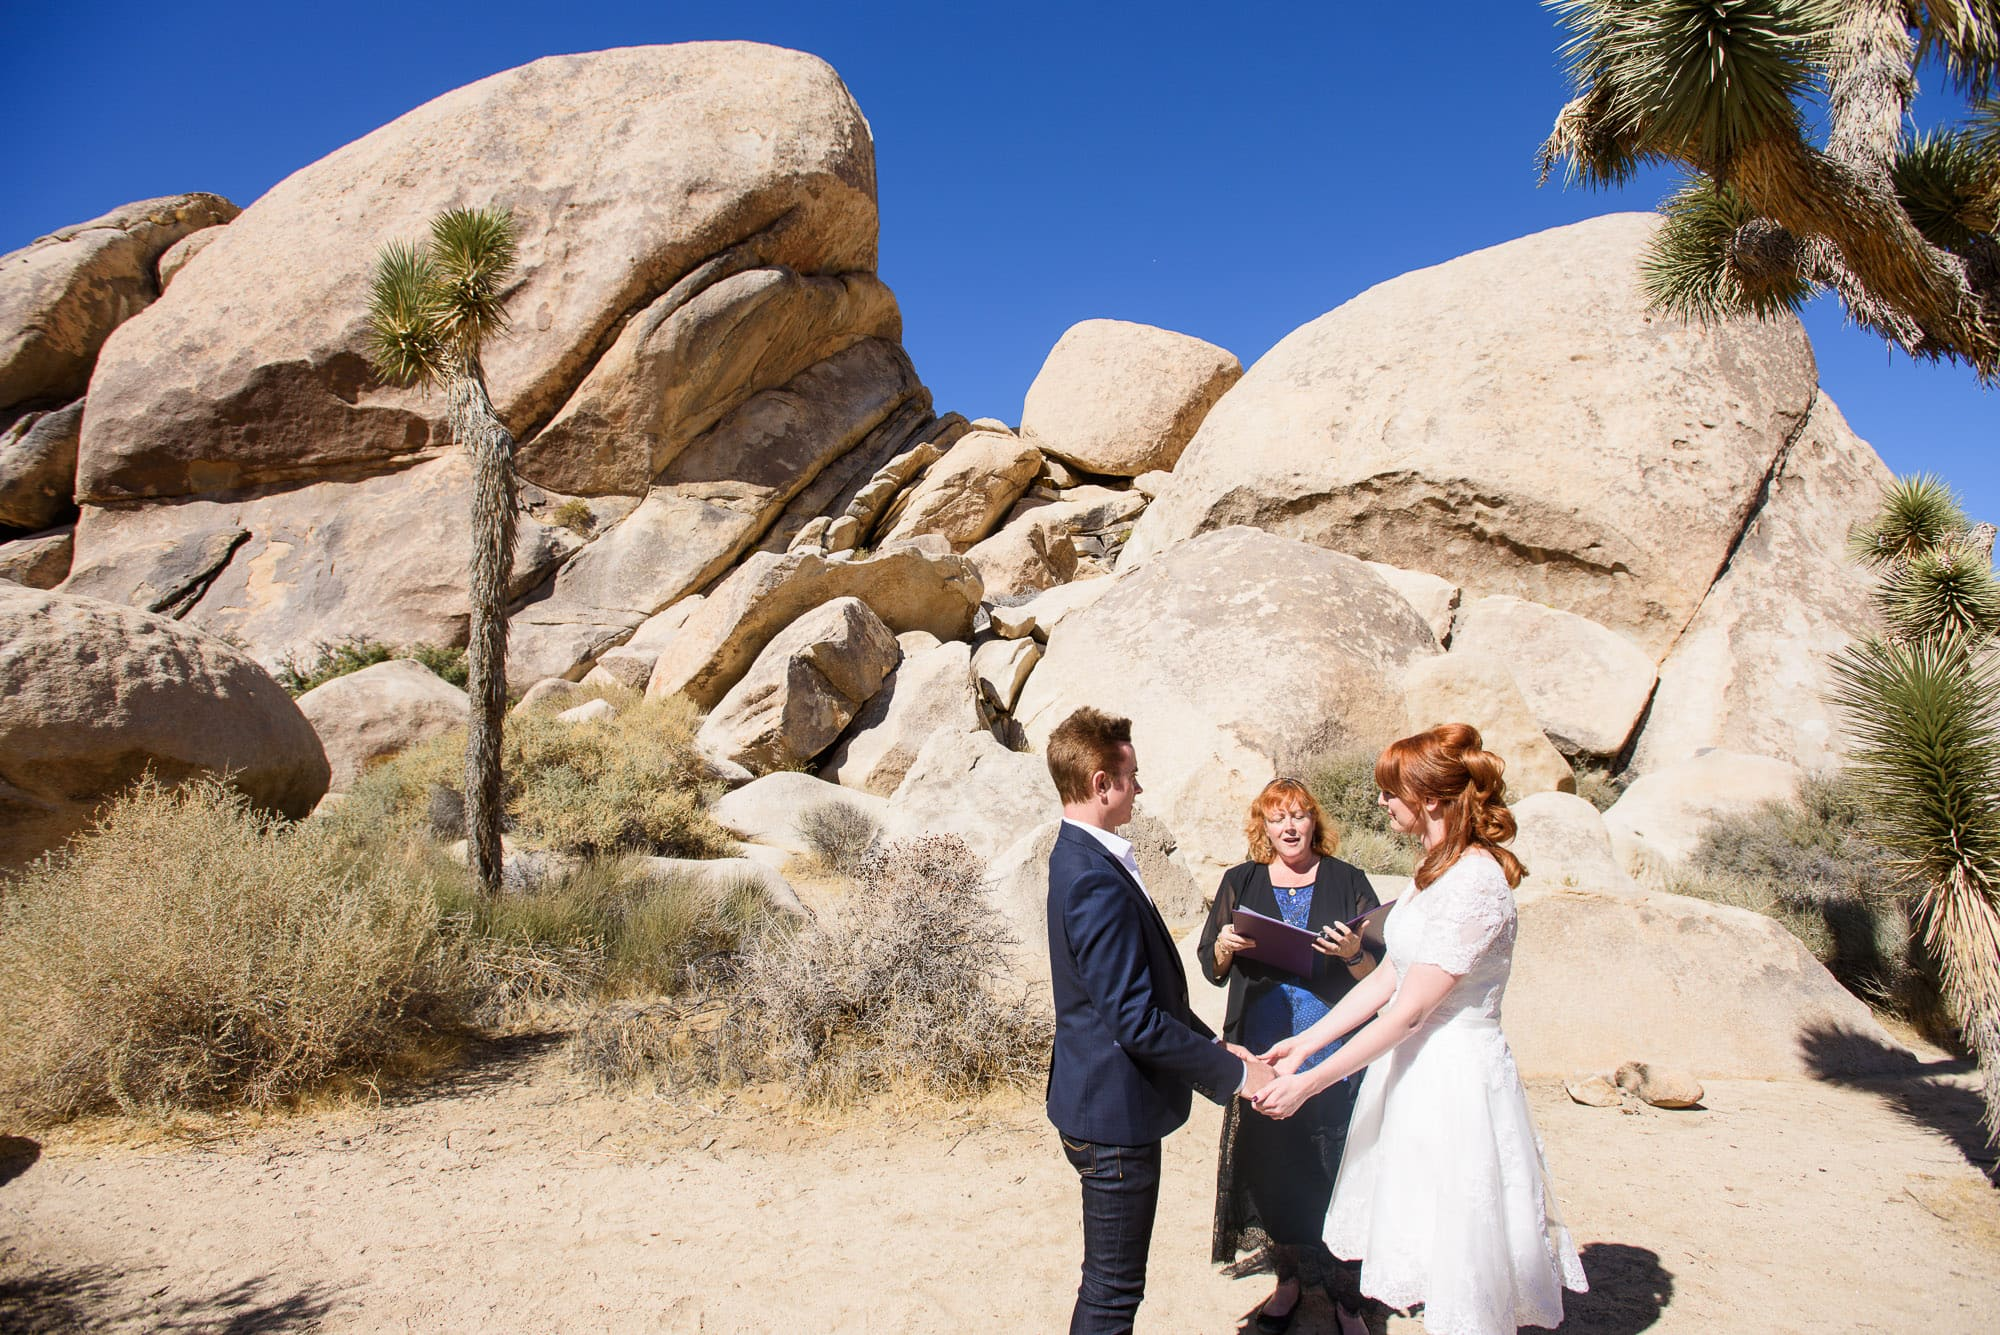 013_Alan_and_Heidi_Joshua_Tree_Destination_Wedding